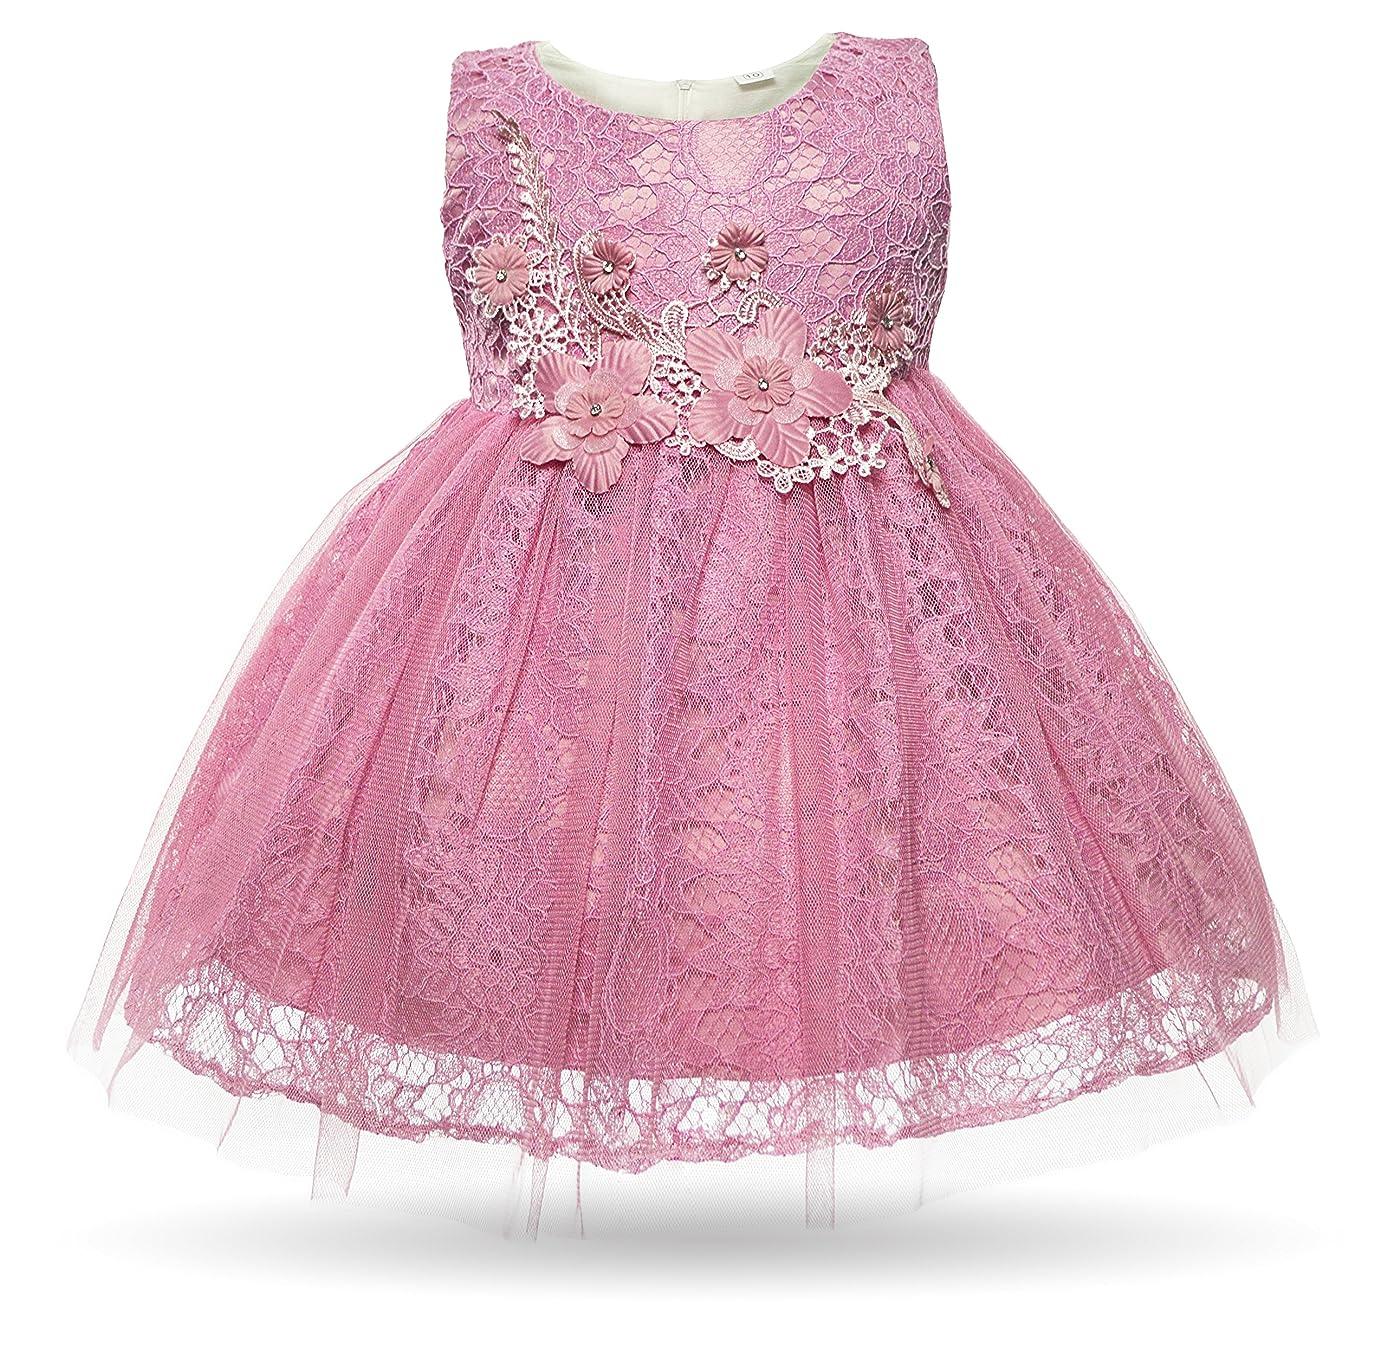 CIELARKO Baby Girl Dress Infant Flower Lace Wedding Party Dresses for 0-24 Months …